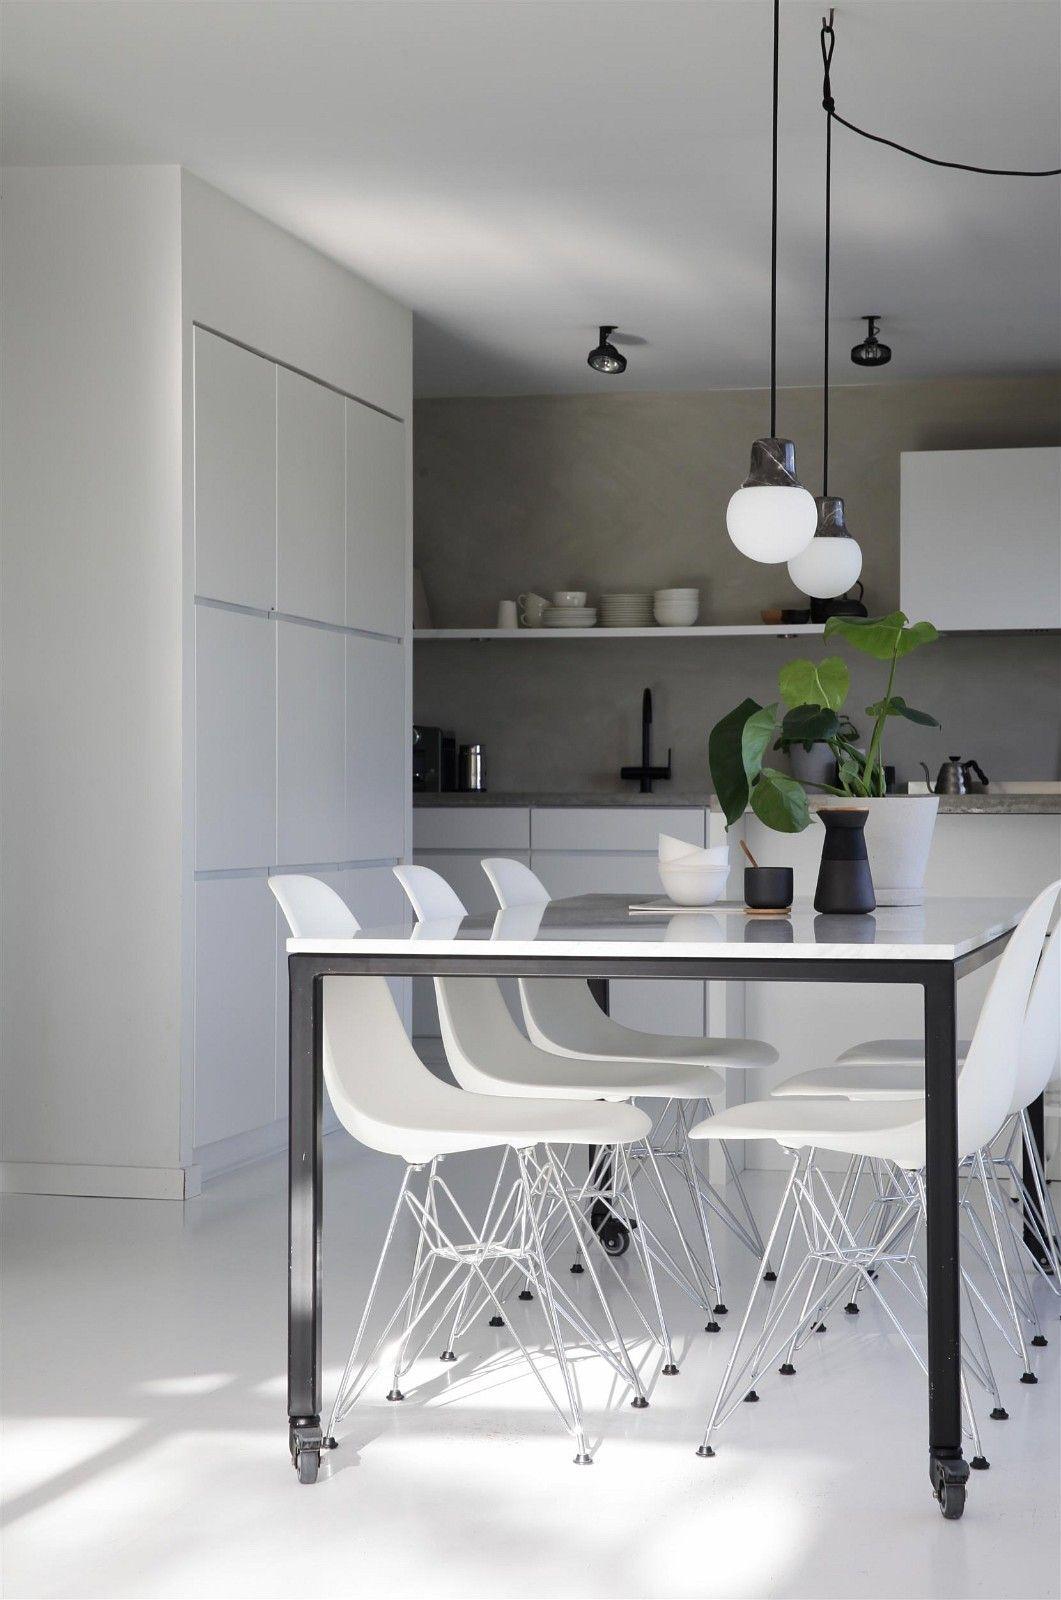 Superbloggarens elisabeth heiers modernt minimalistiska hem till